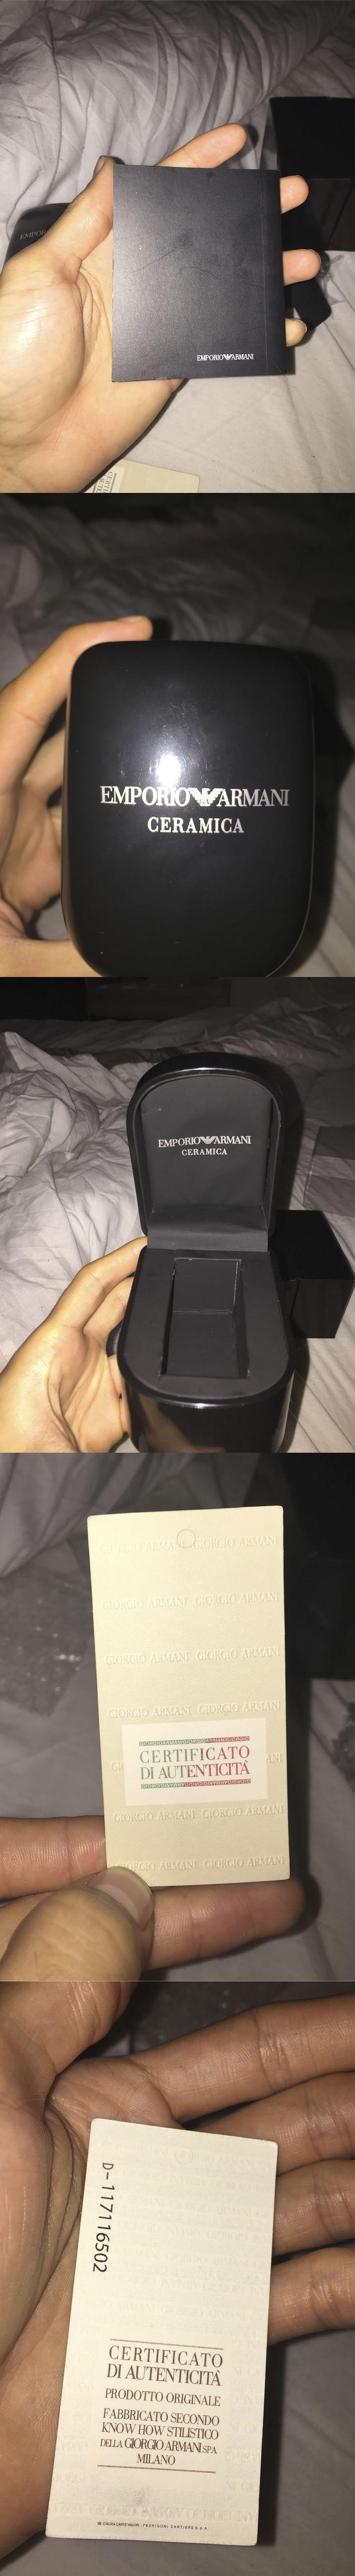 How to spot a fake Emporio Armani EA watches